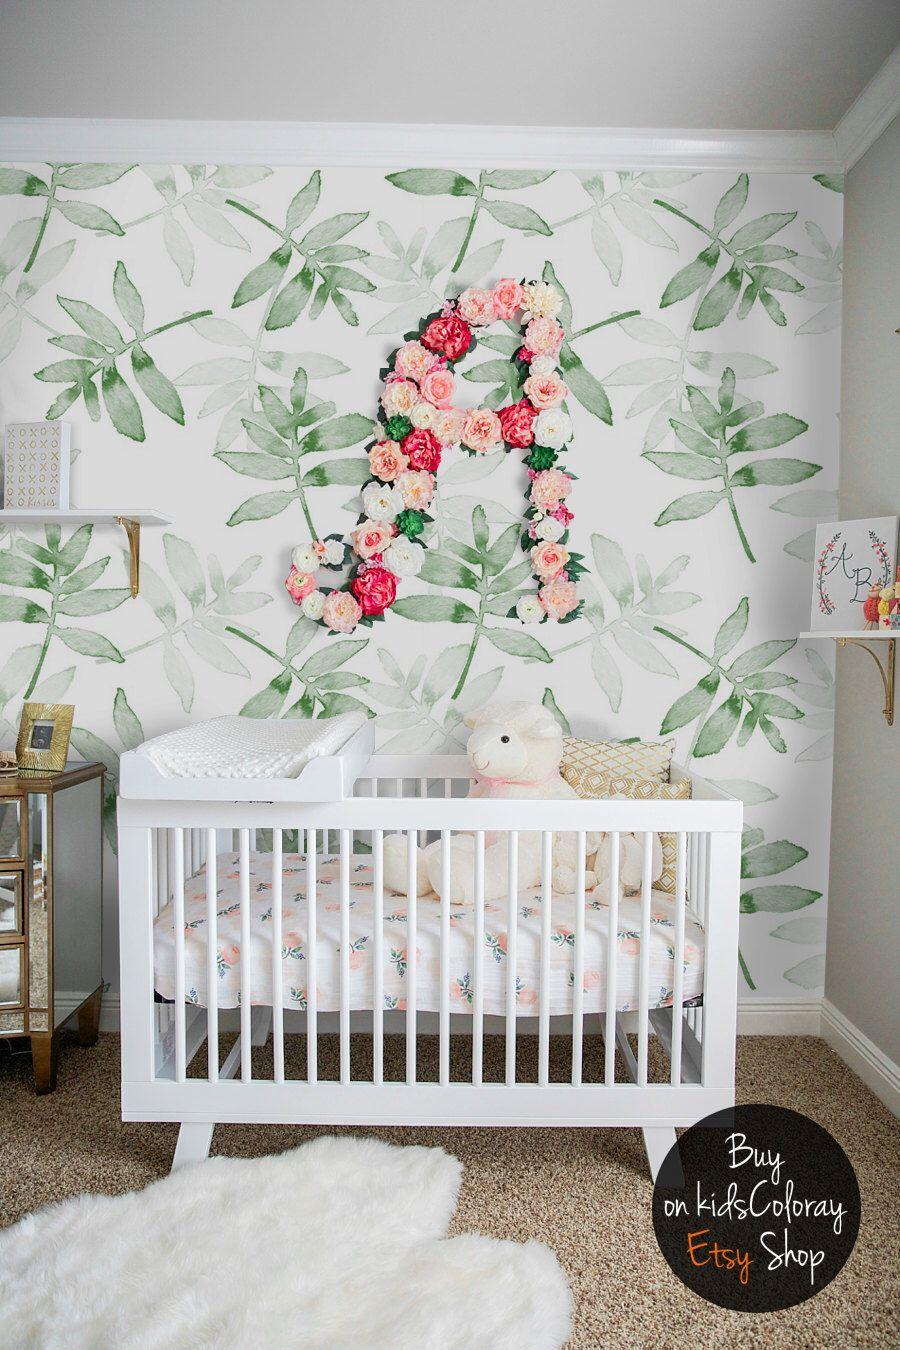 Green Leaves Wallpaper Tropical Plants Wall Mural Kids Nursery